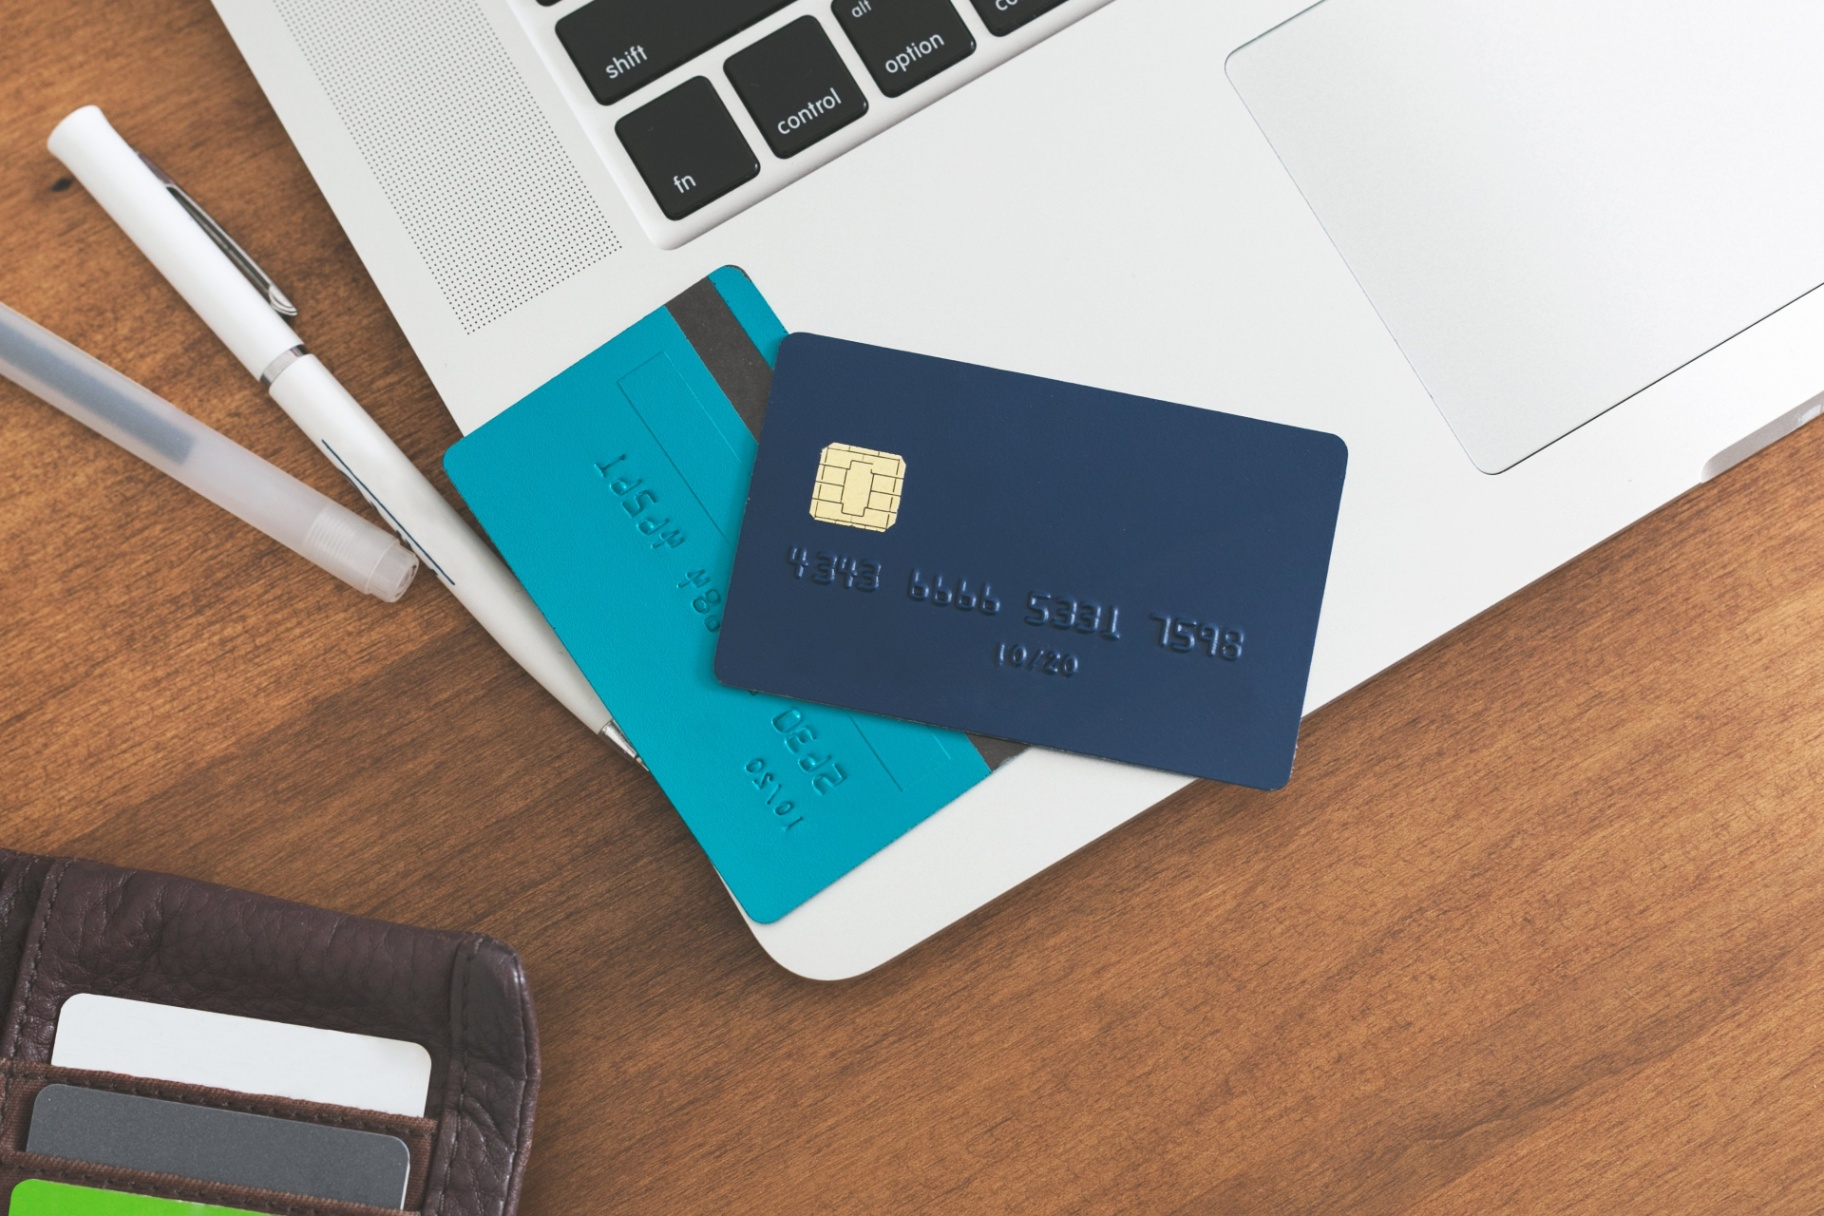 Veja como solicitar empréstimo na Quero Financiar